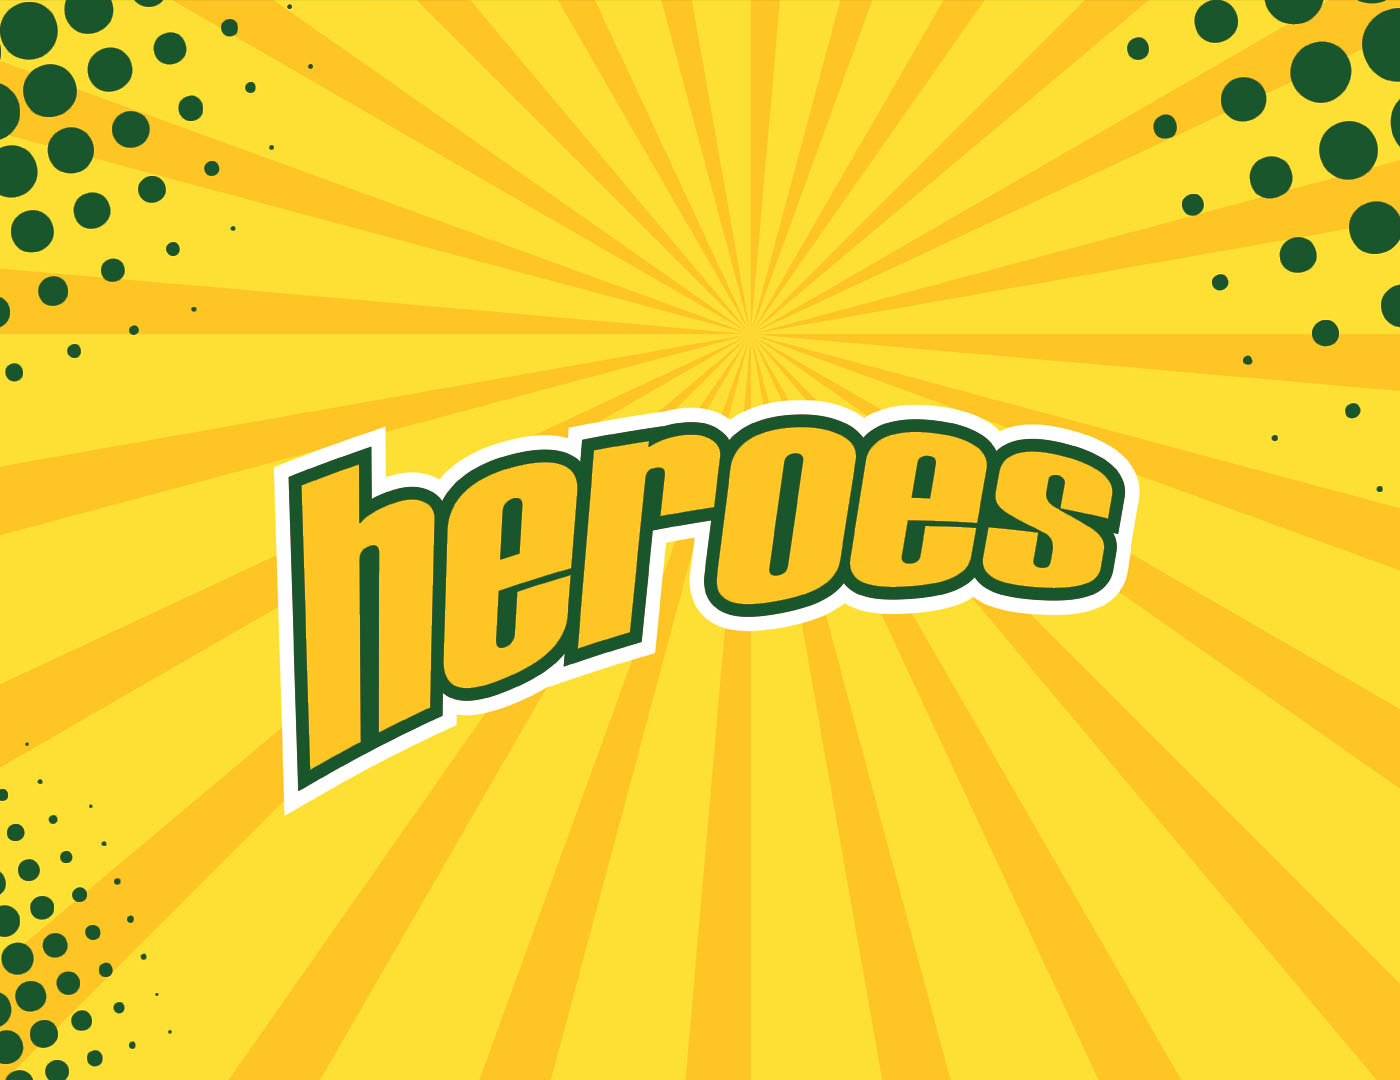 Collider Heroes - New Batman V Superman Pics With Darkseid Teaser